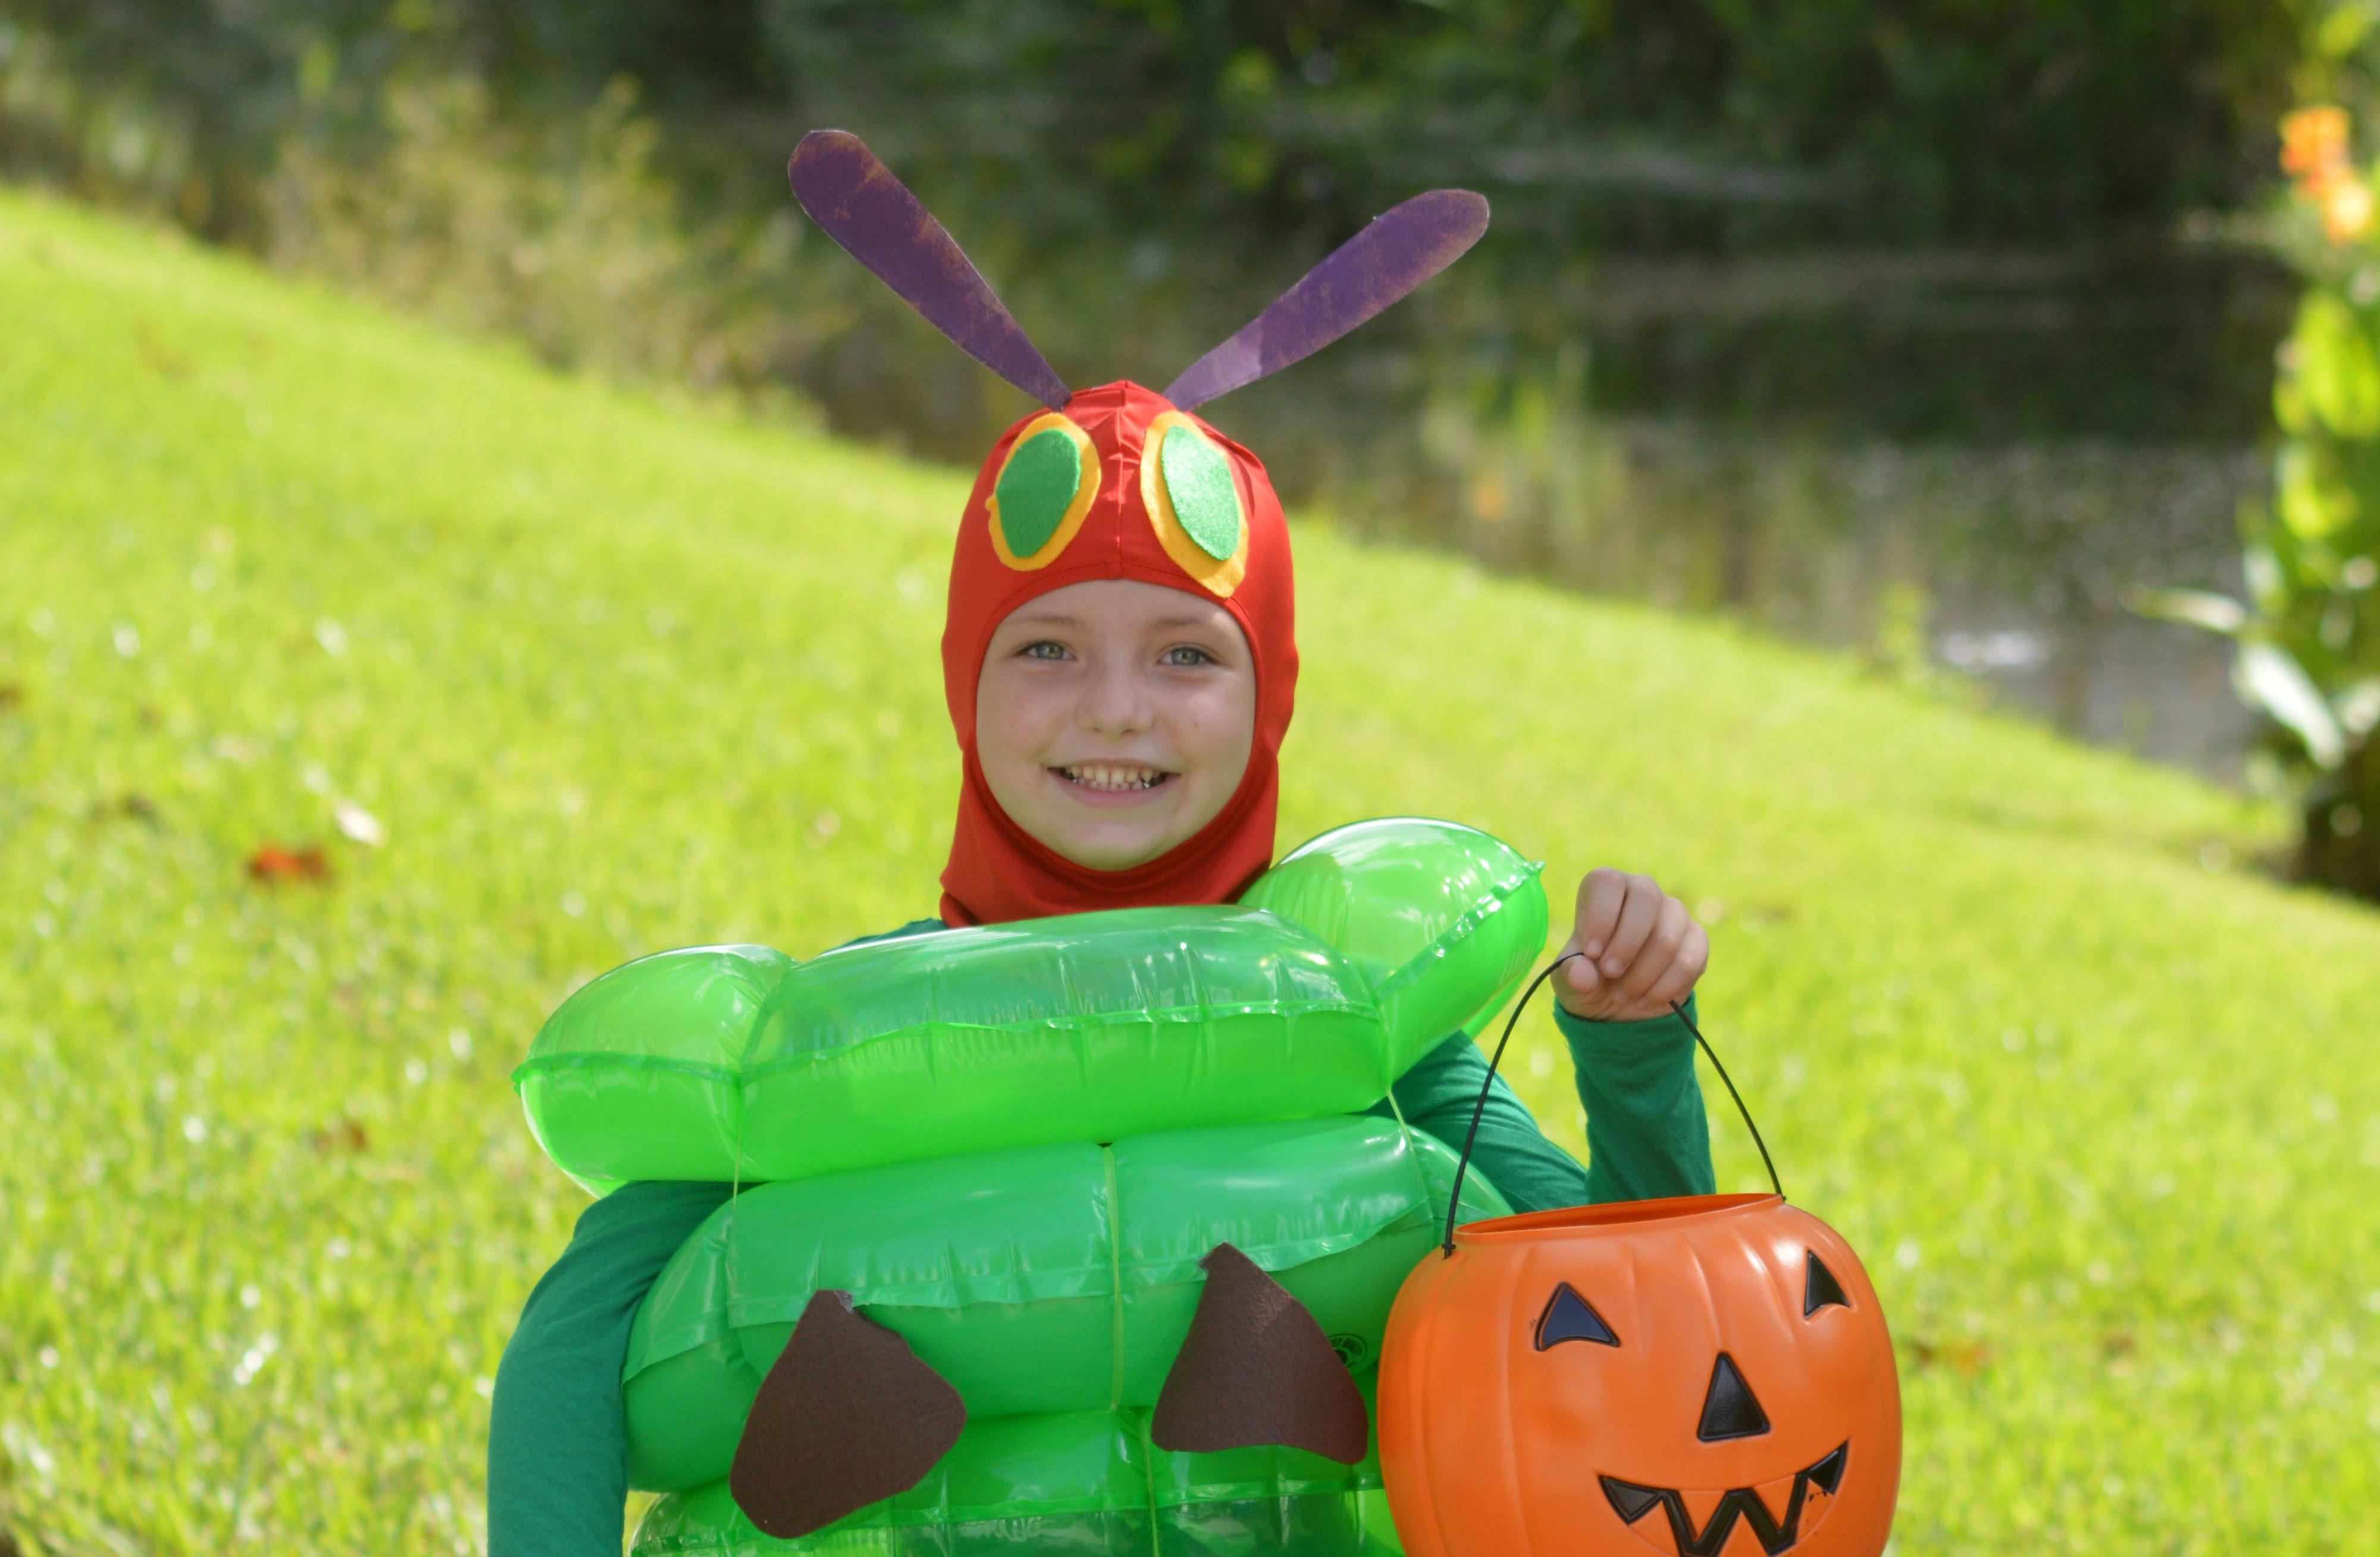 Diy kids halloween costume the hungry caterpillar margaritaville blog solutioingenieria Choice Image